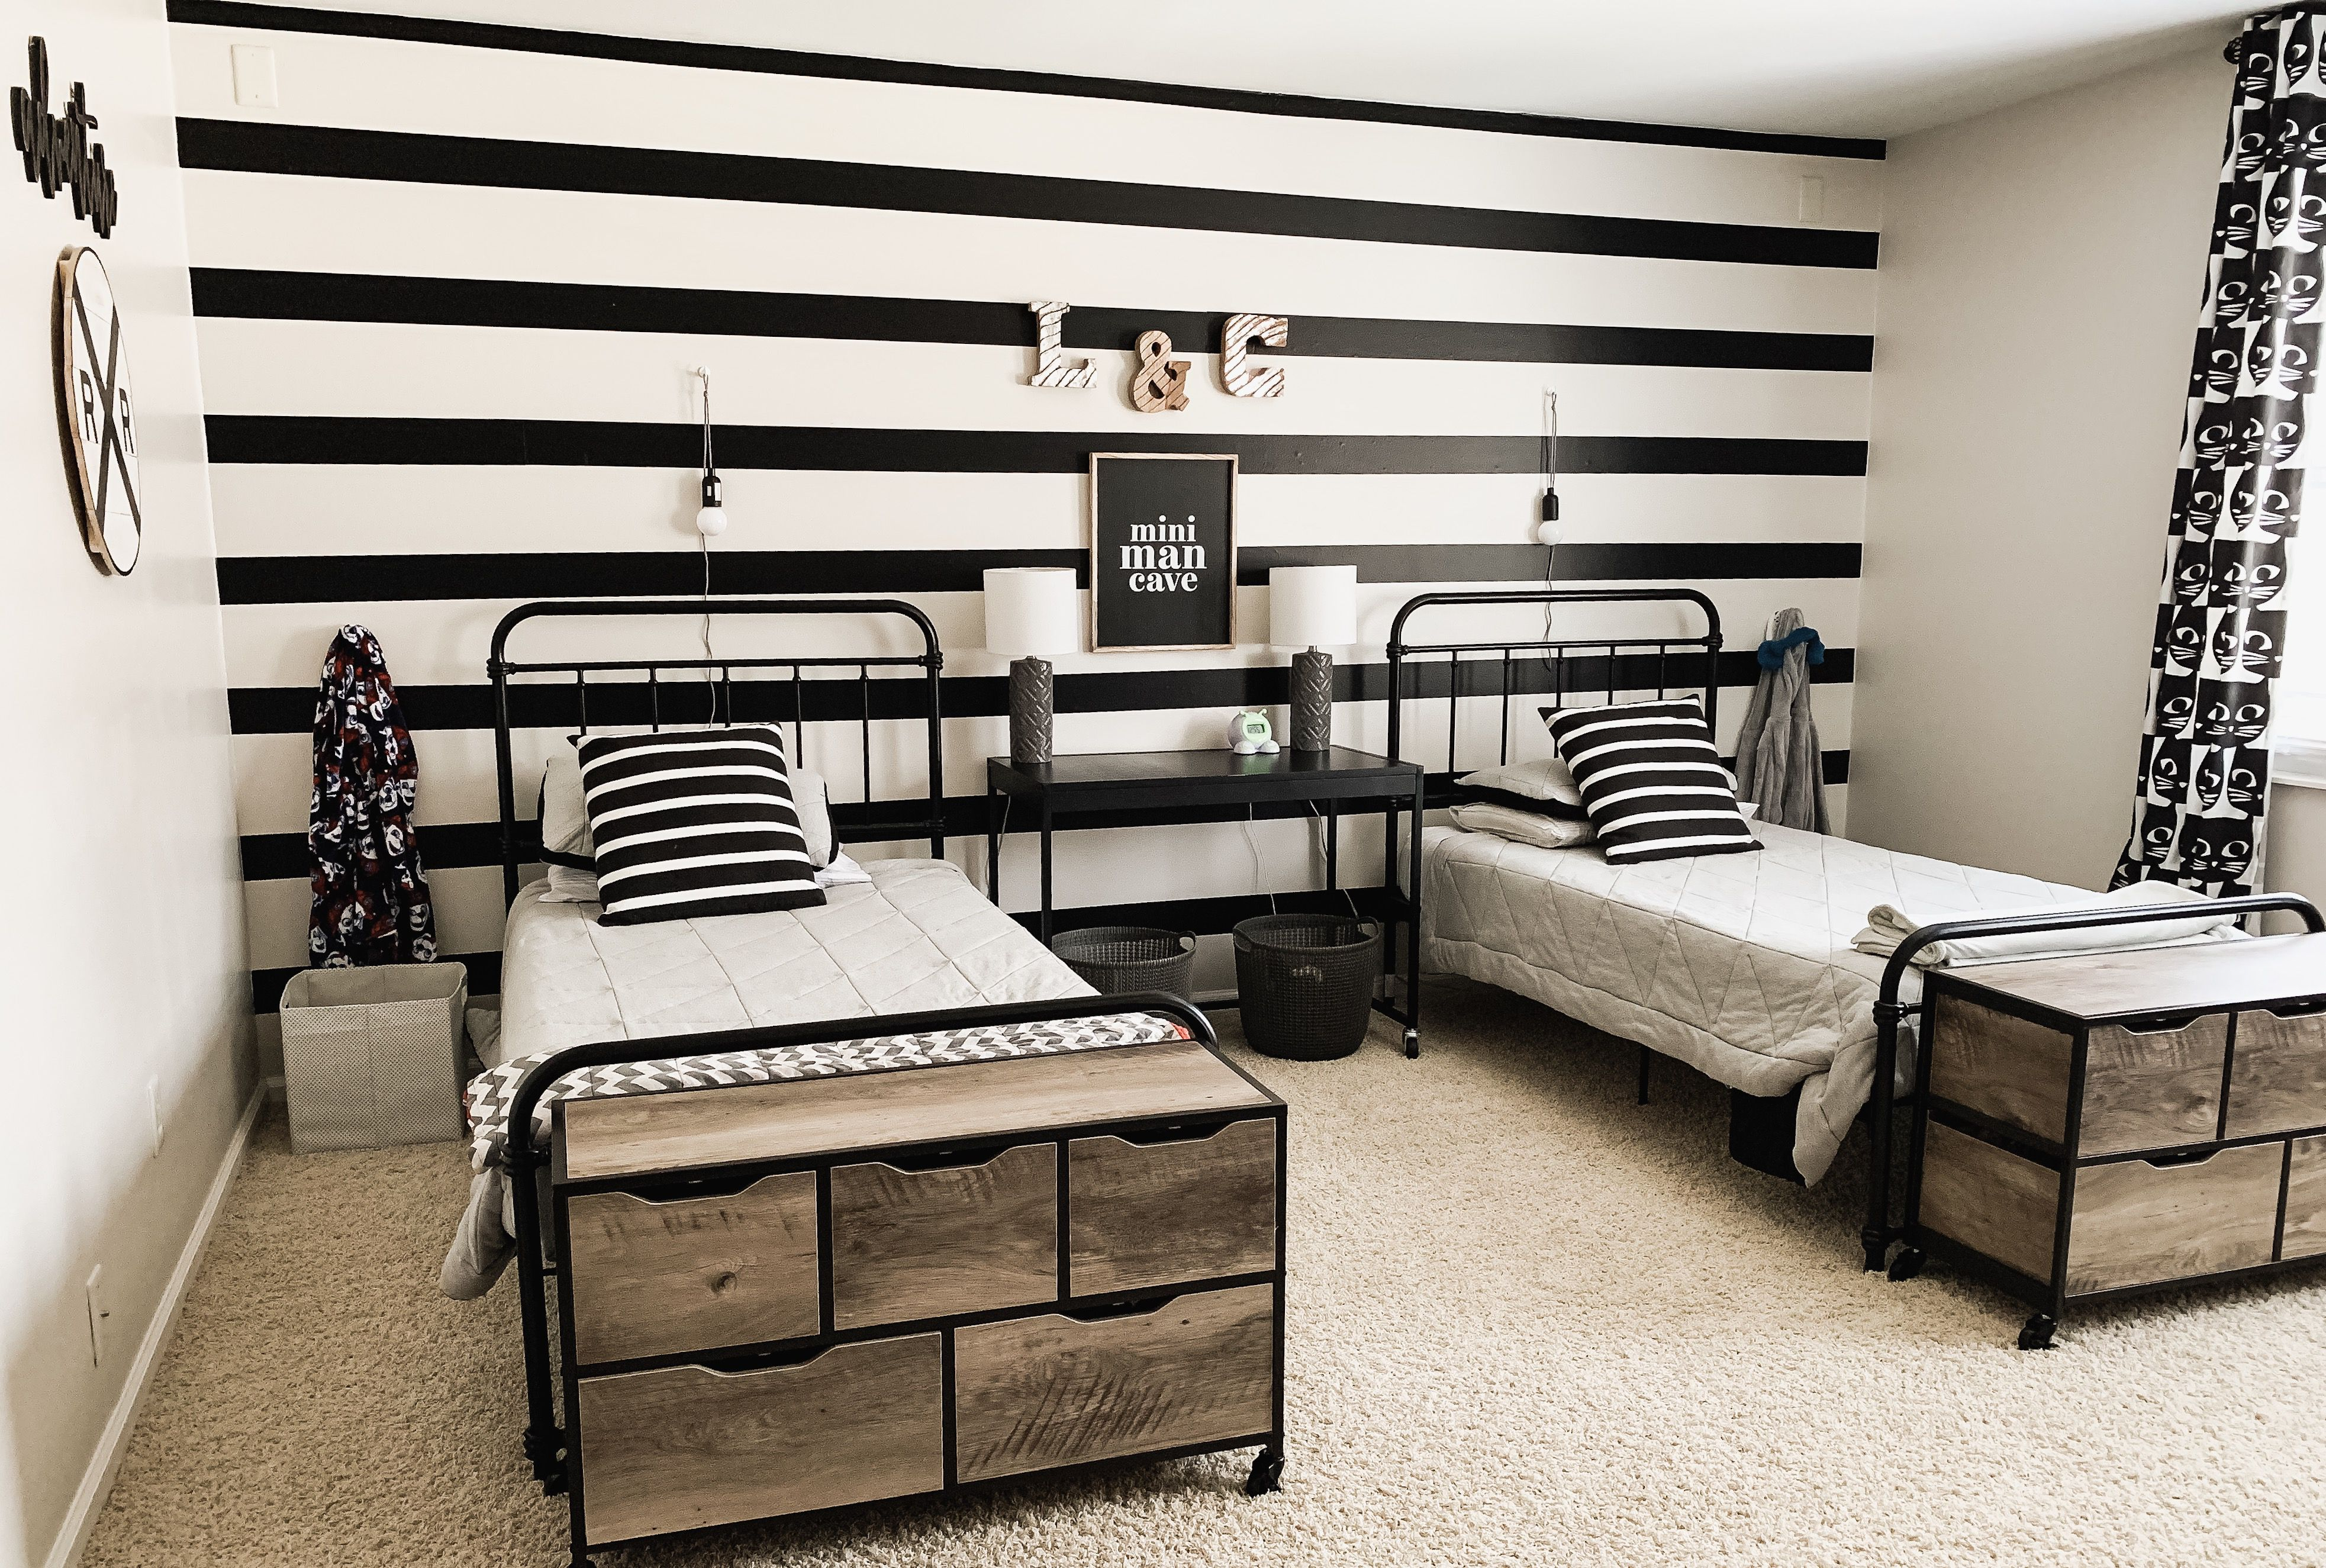 Farmhouse kids bedroom | Farmhouse bedroom decor, Home decor